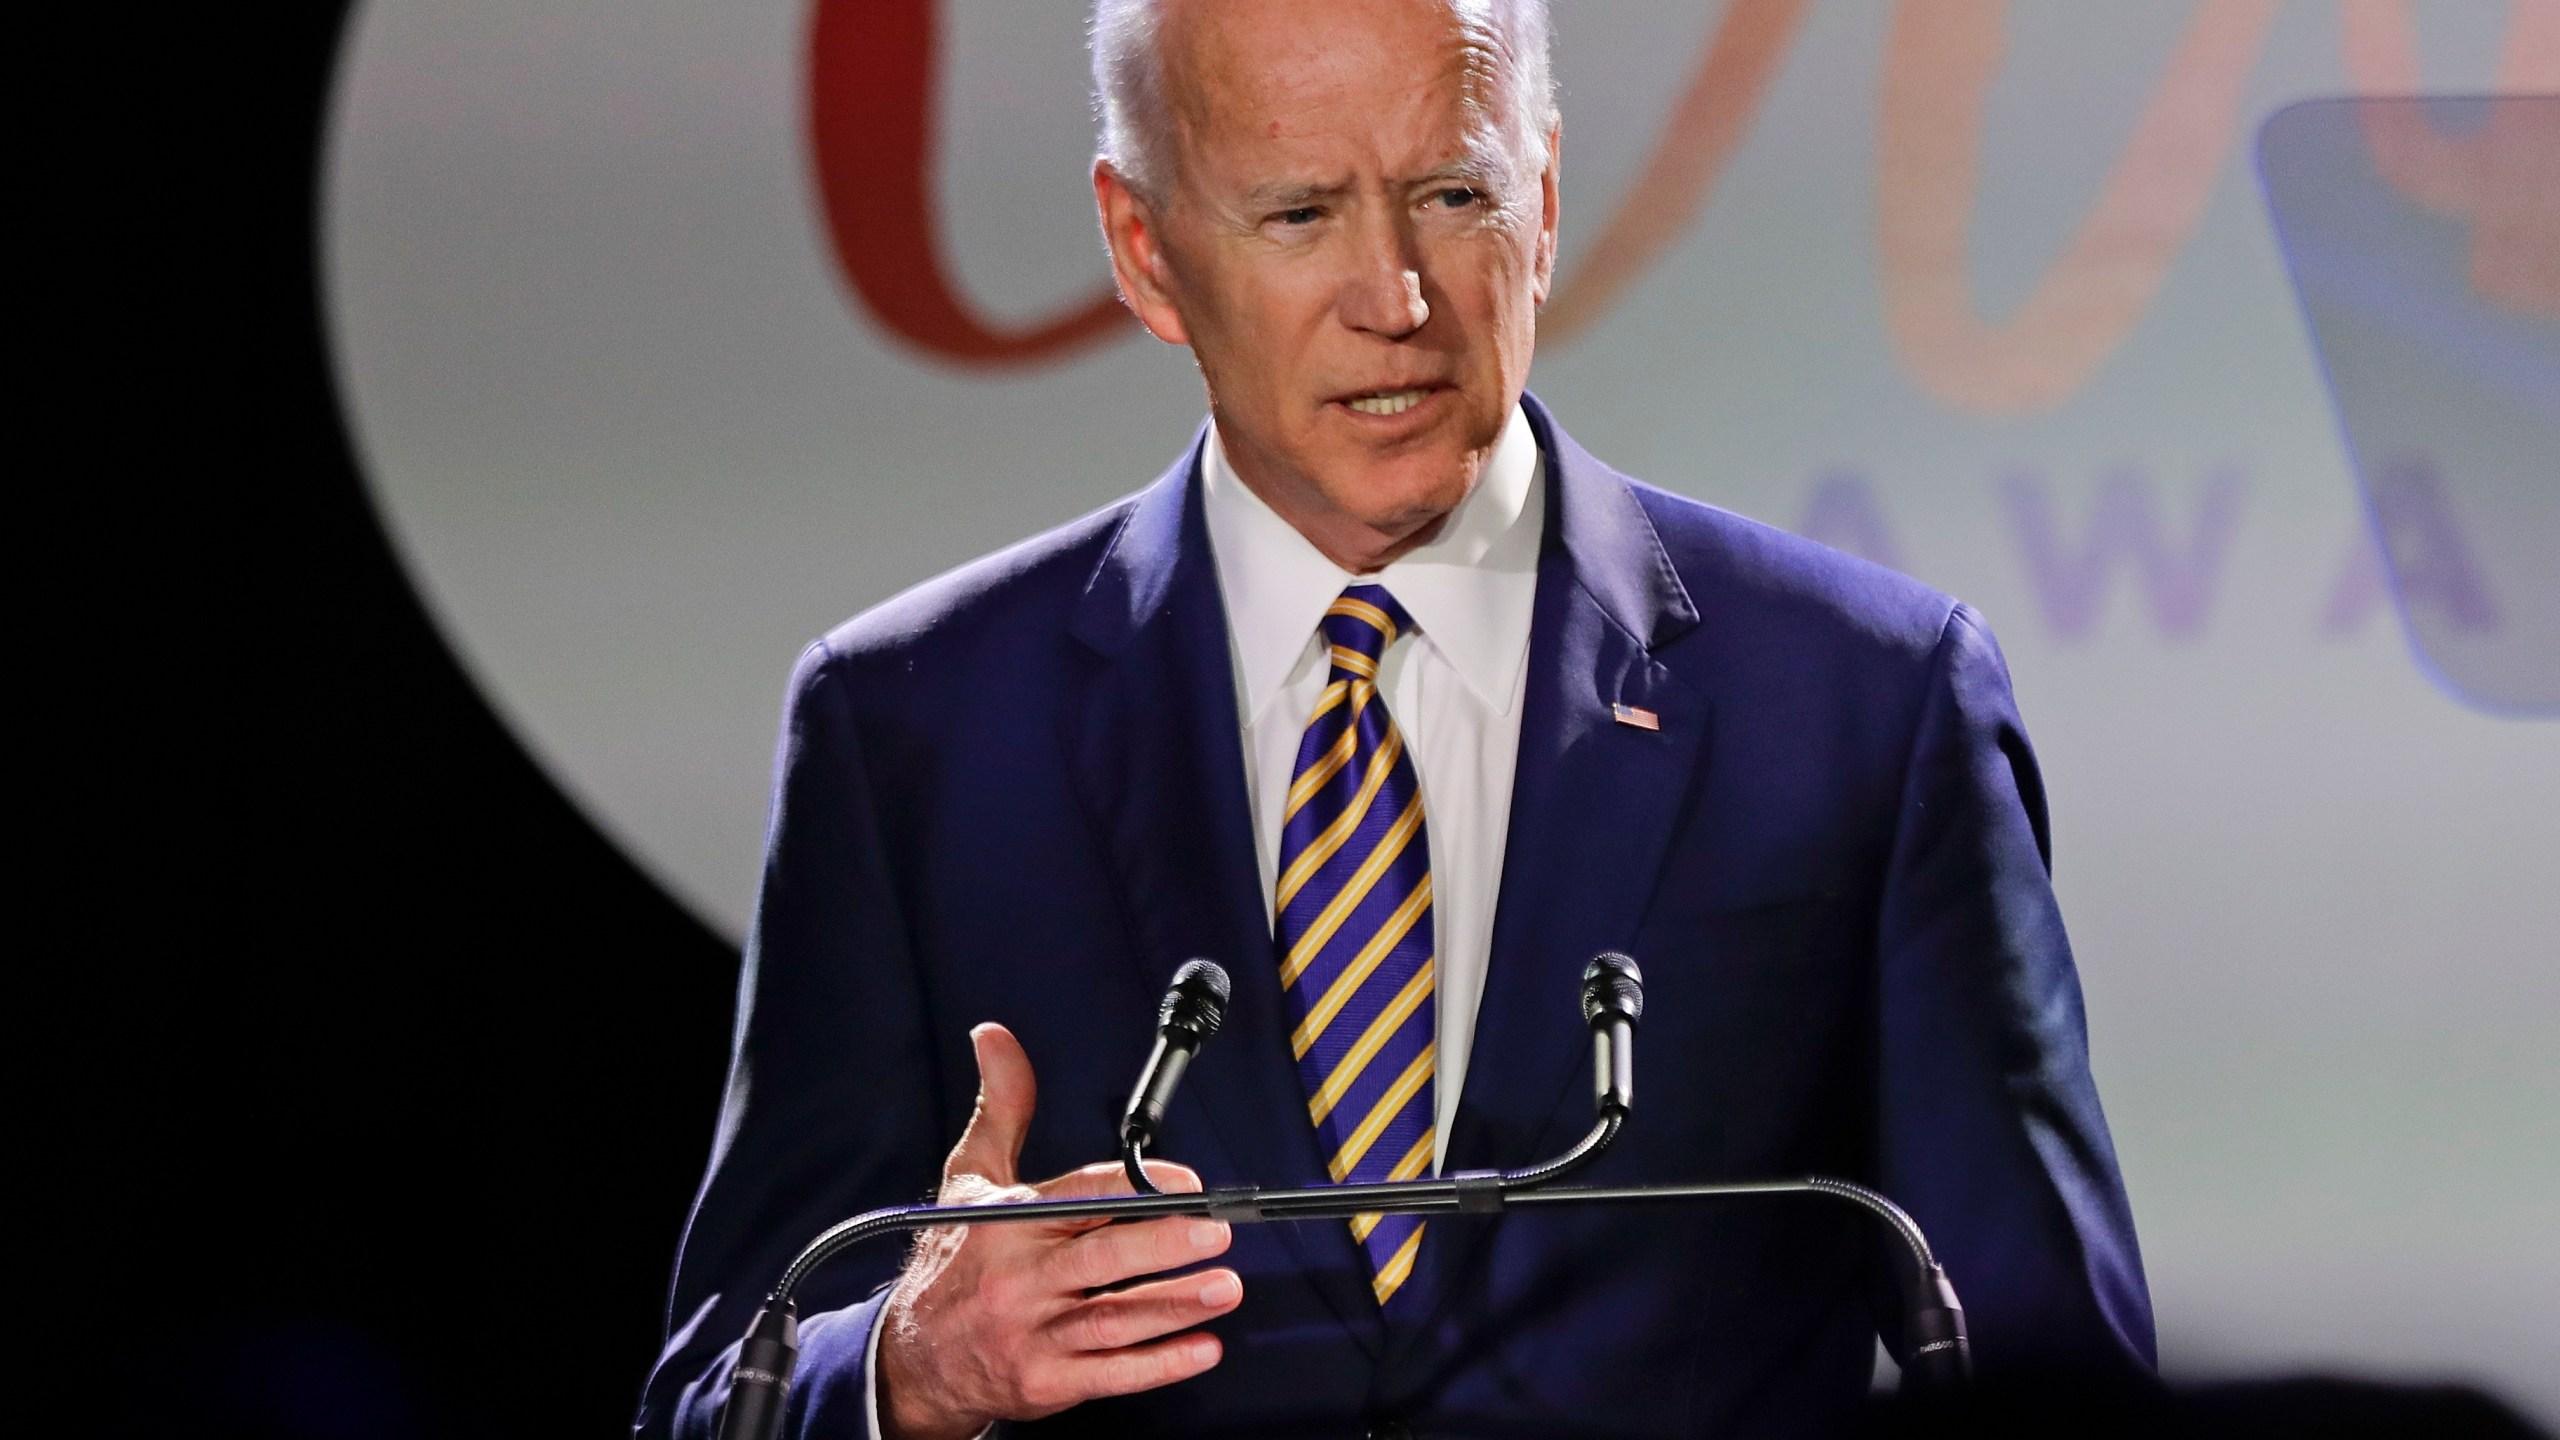 Election_2020_Joe_Biden_87877-159532.jpg59322777